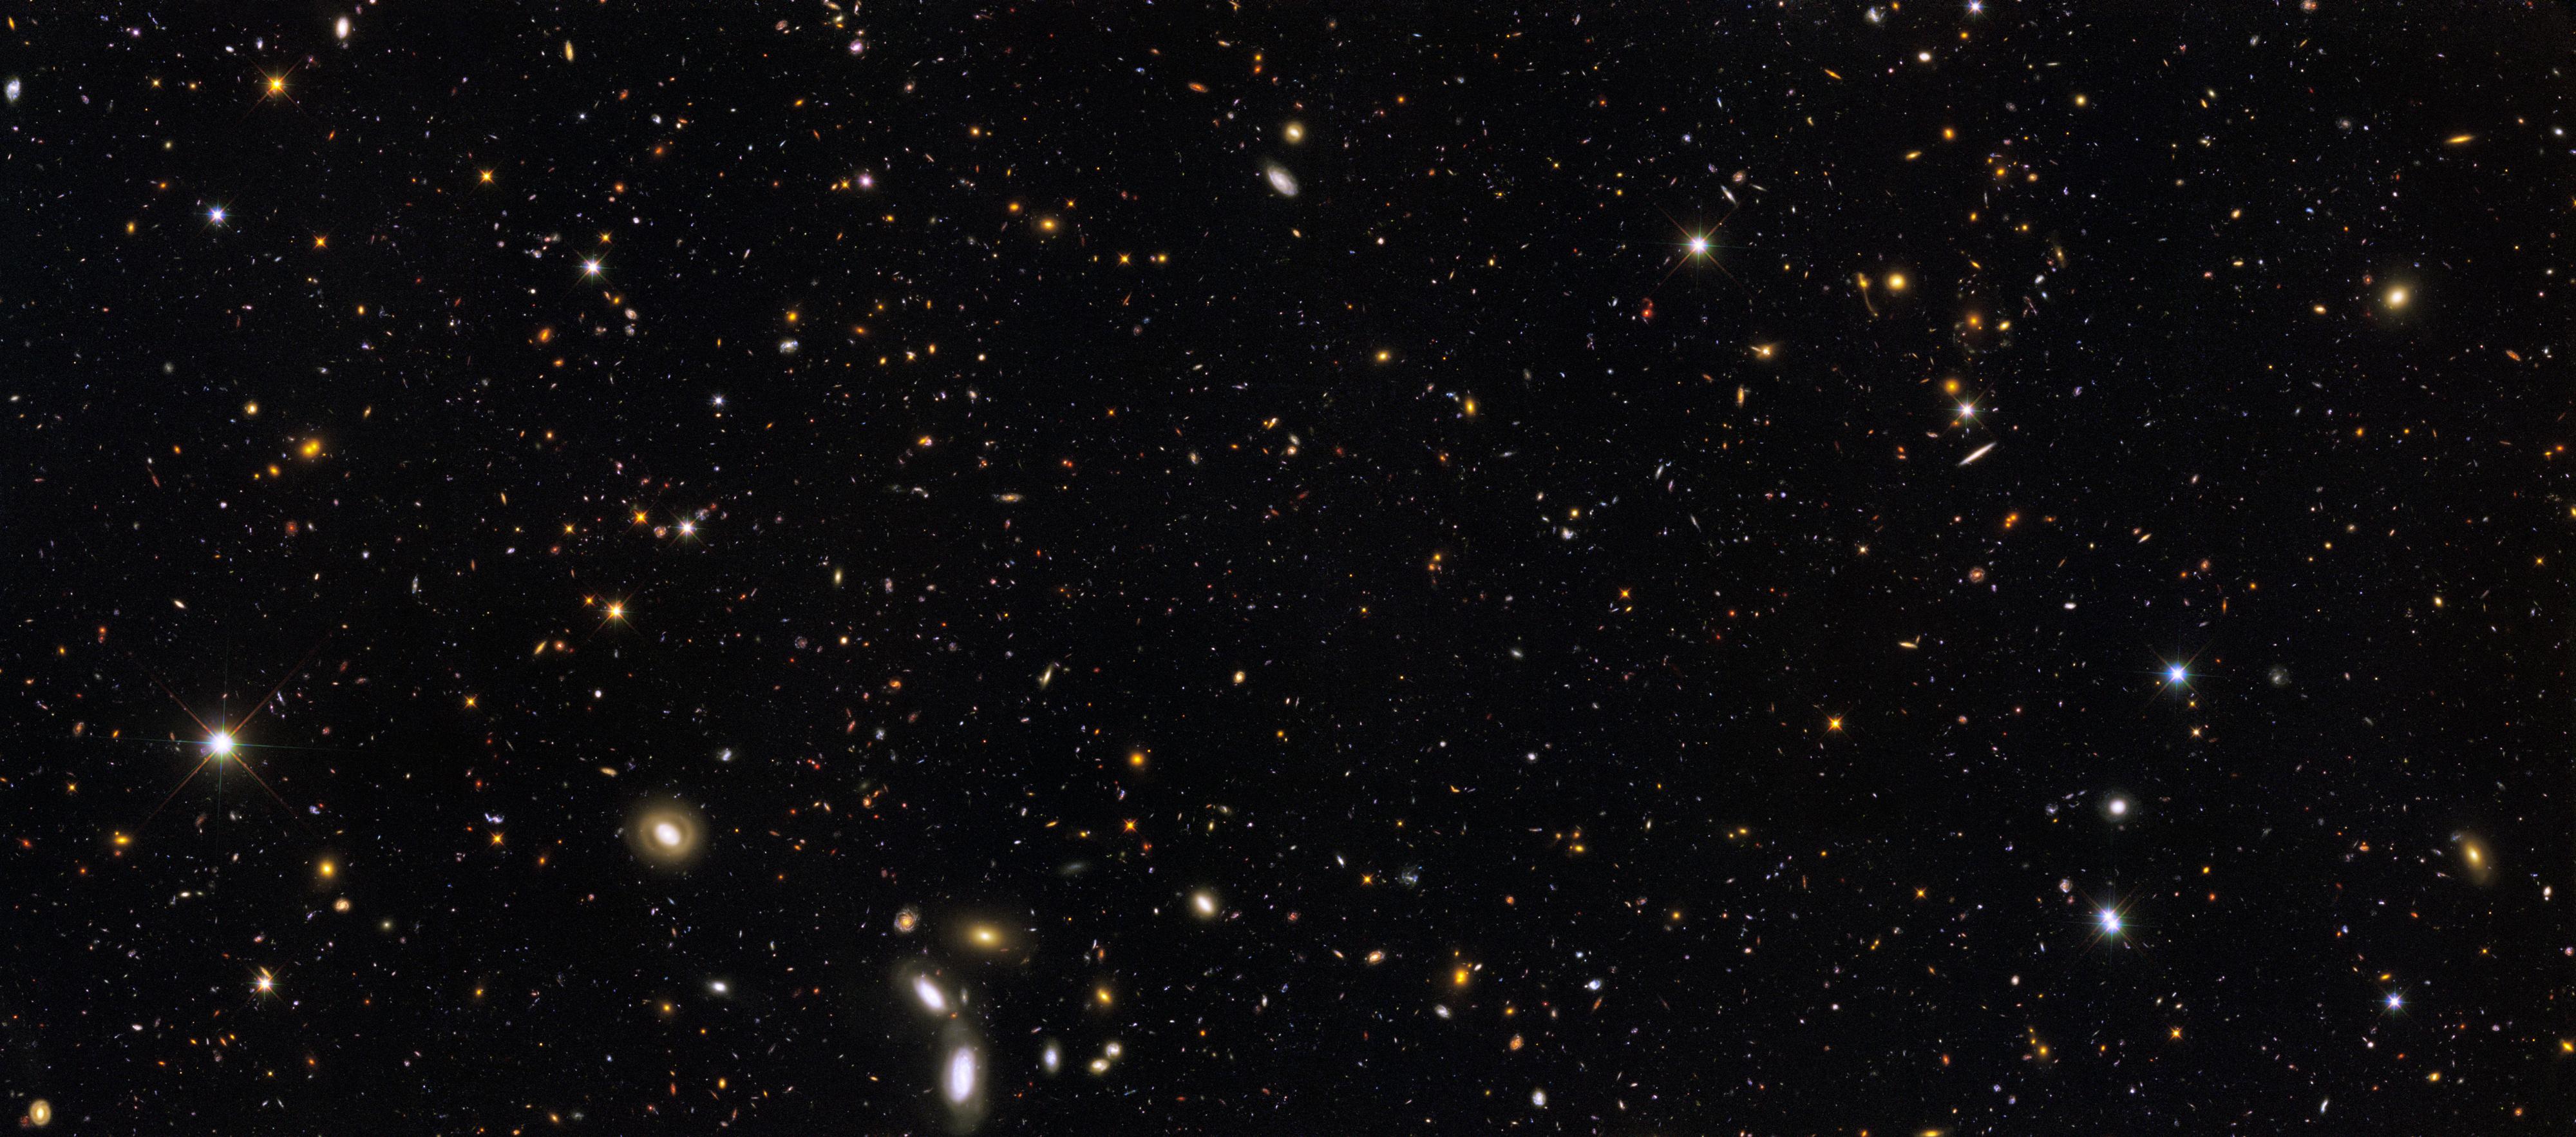 GOODS/ERS2 Field | ESA/Hubble